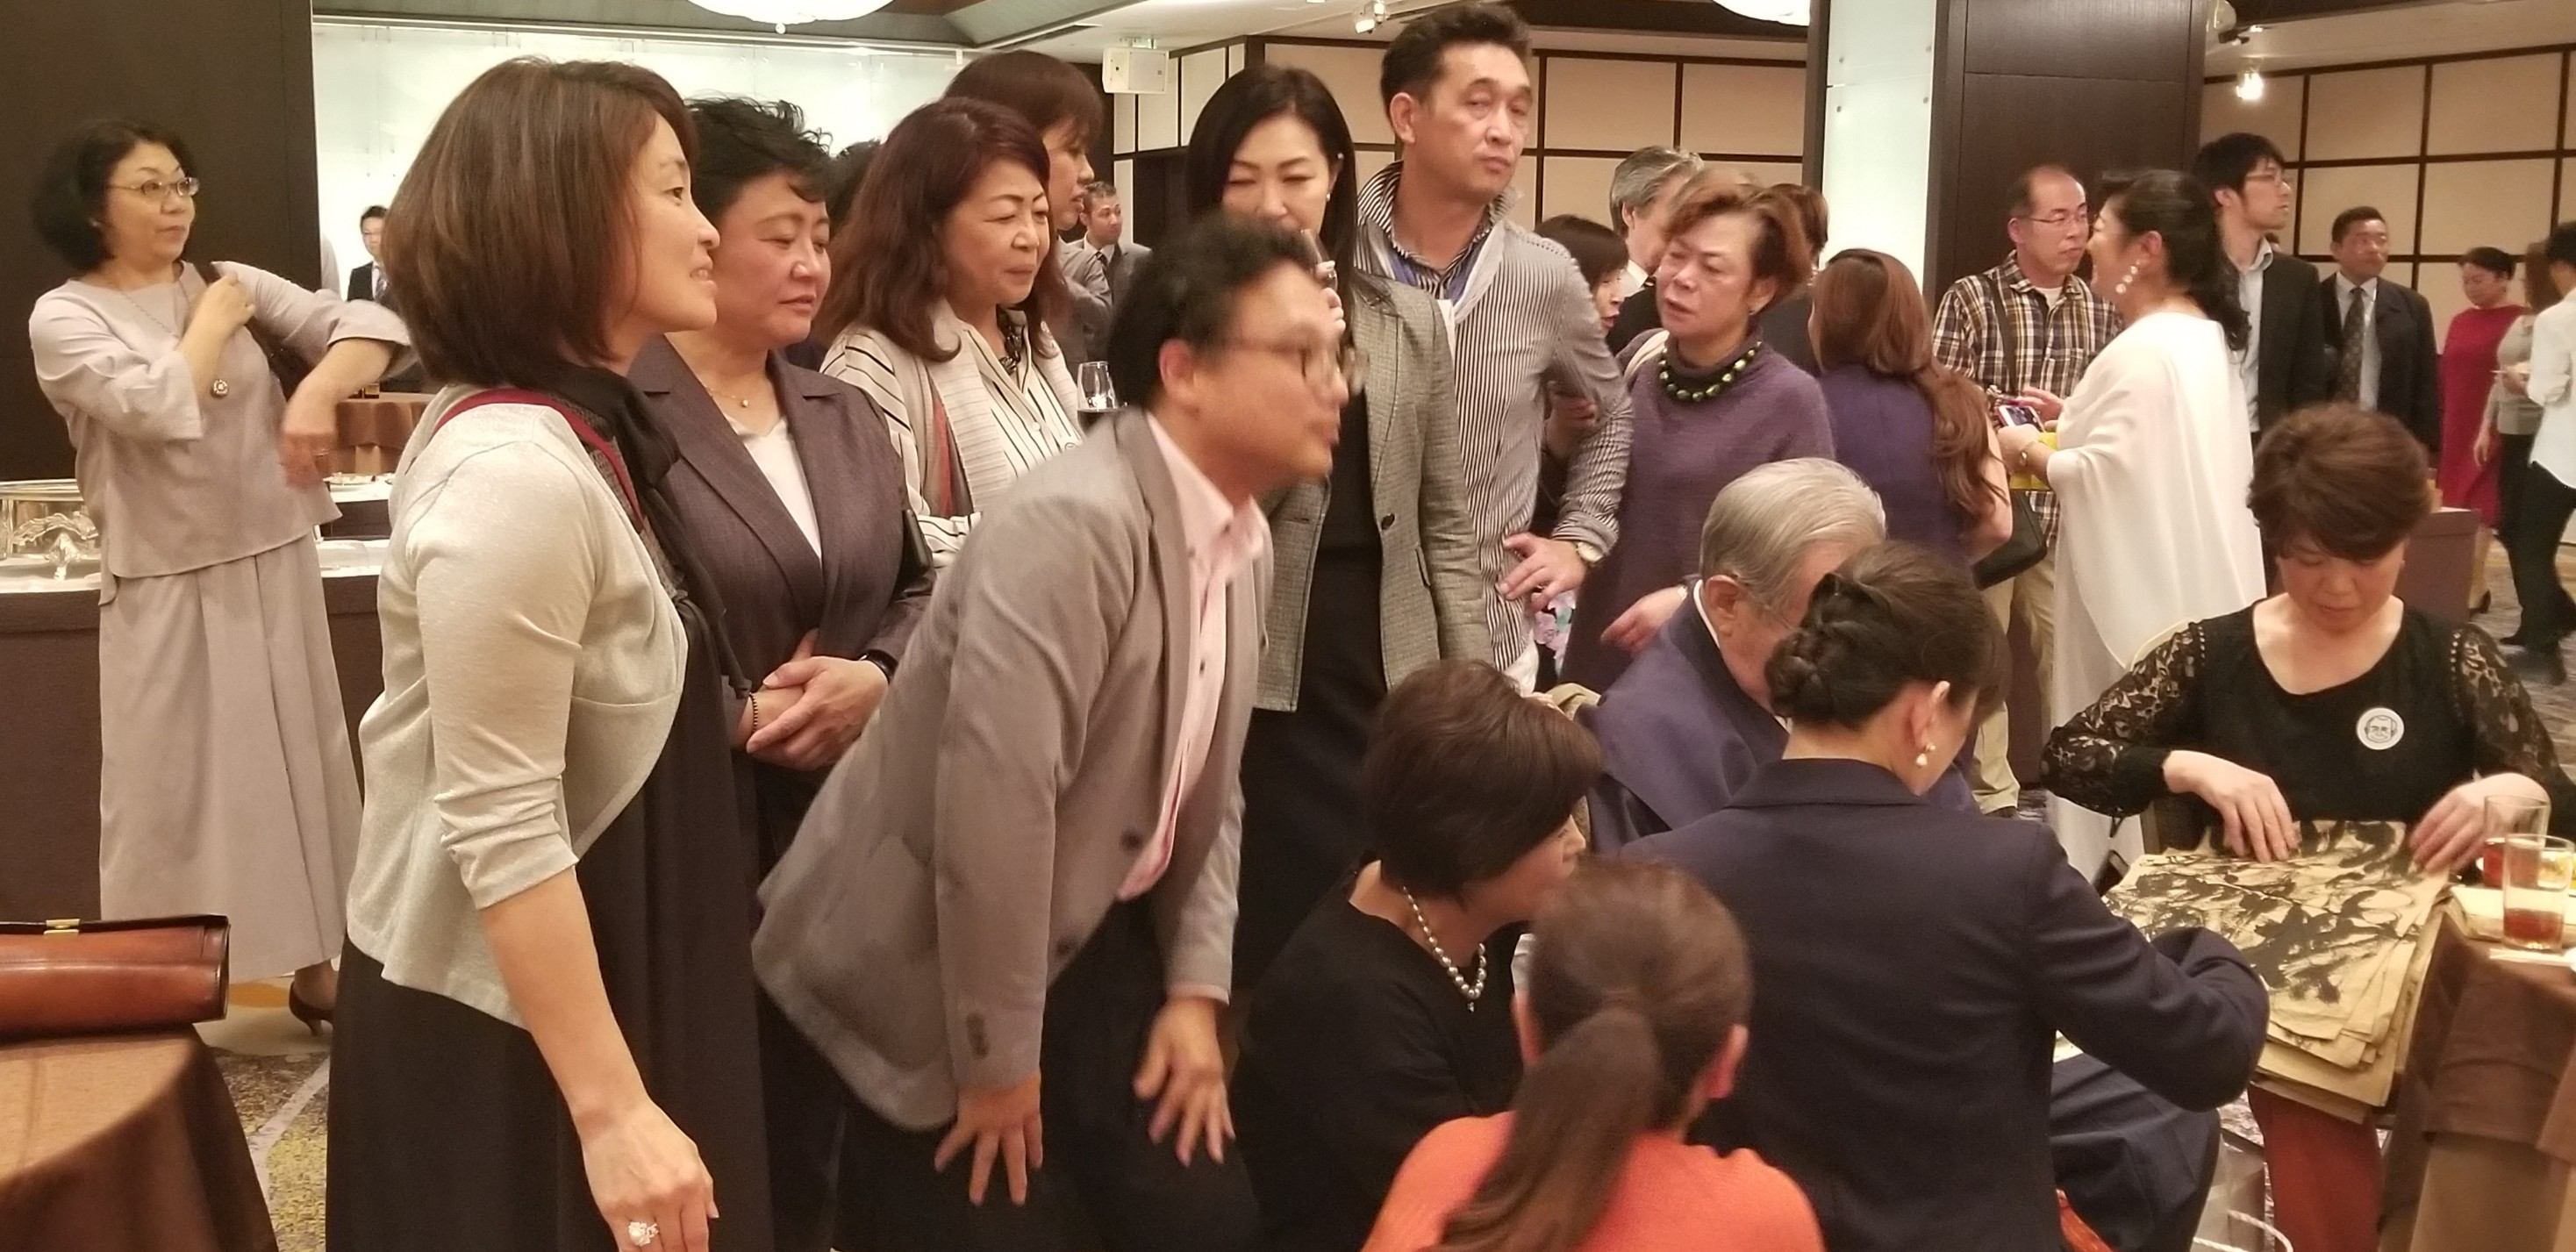 c17ef5f86a4605cfe3e99b7780037d9b - 第6回思風会全国大会2018in東京開催